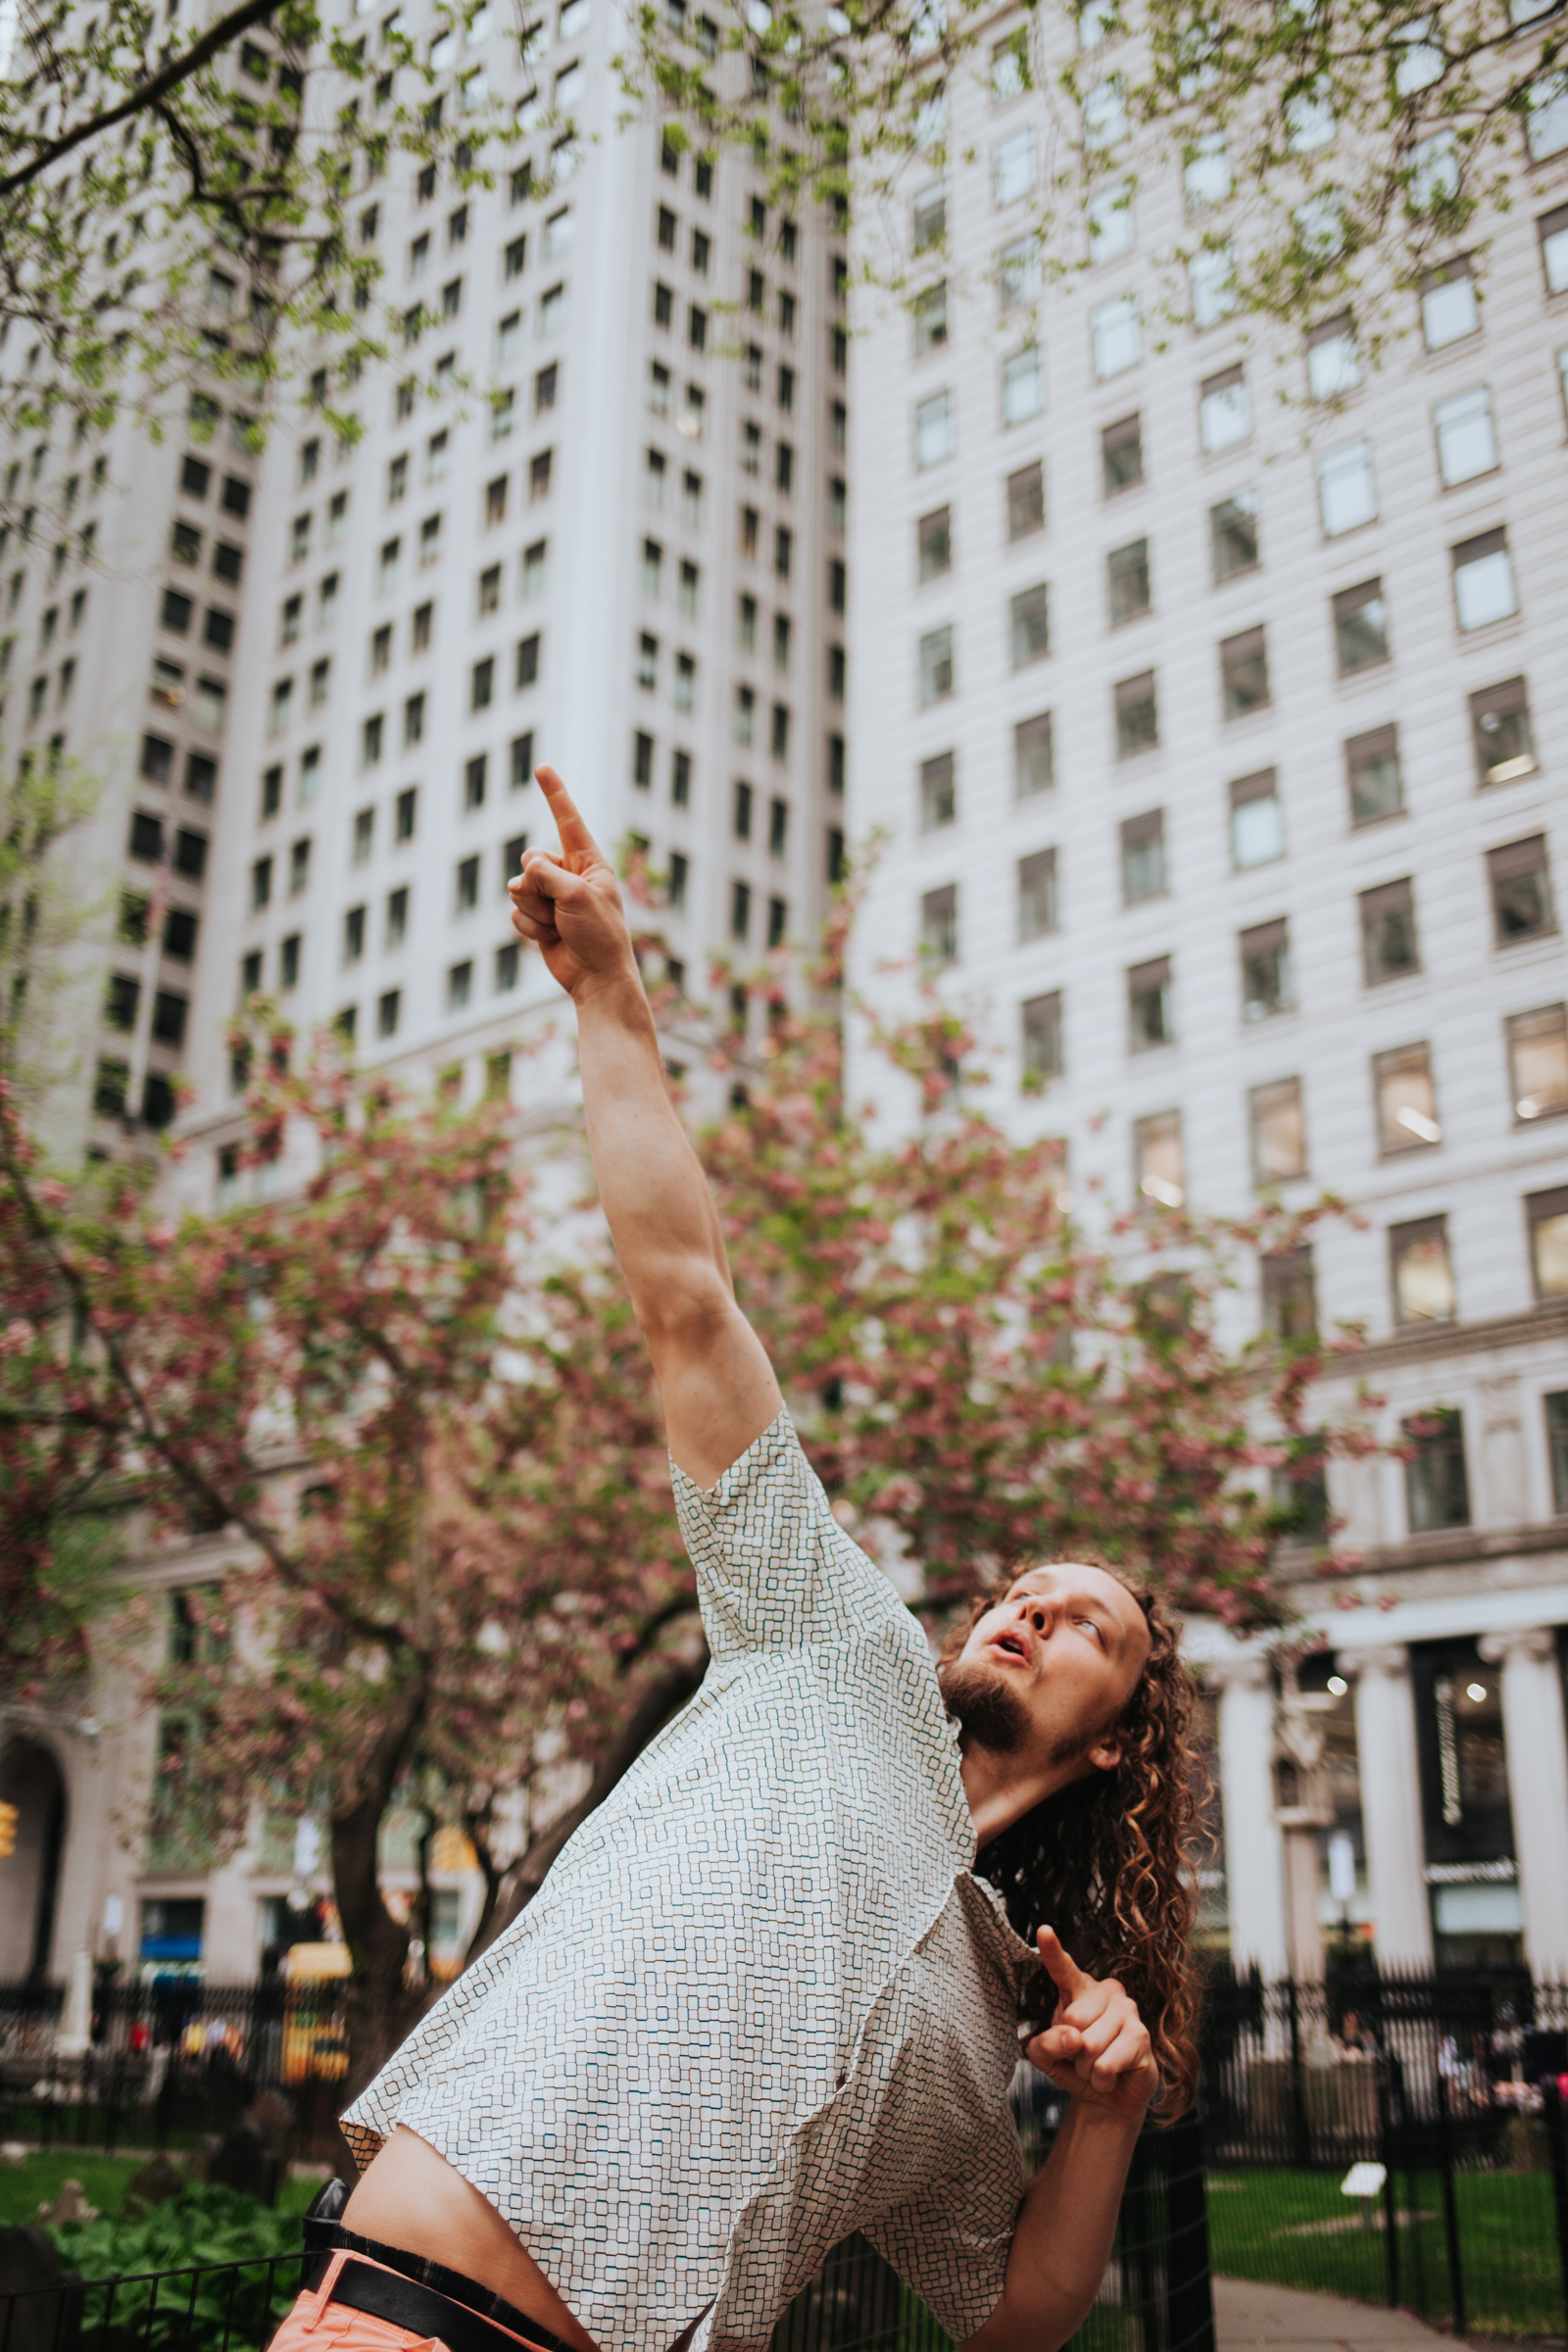 NYC_Vacation_Favorites-31.jpg